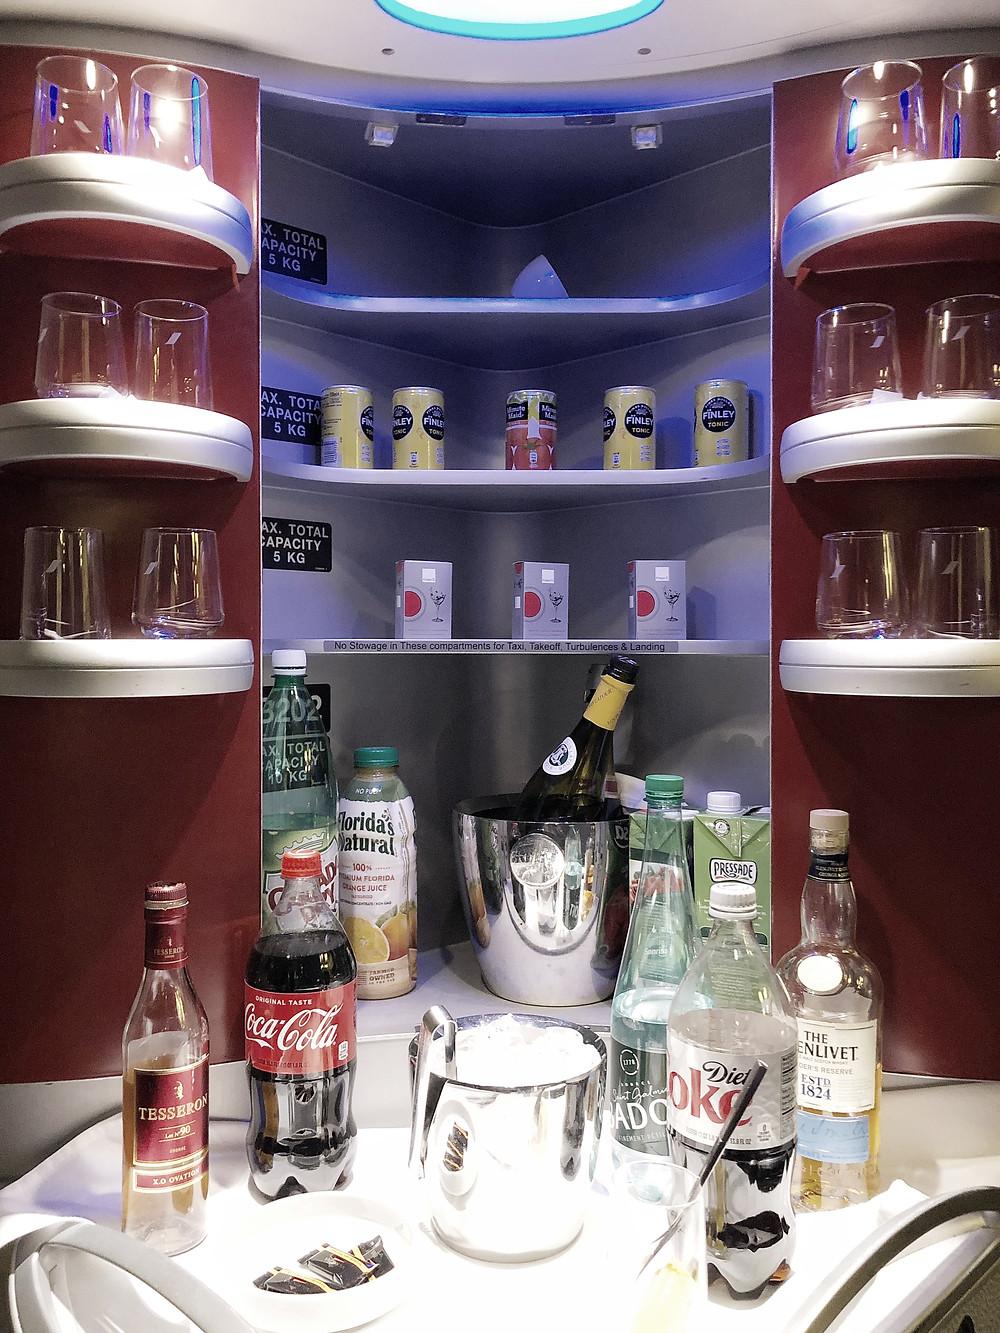 Air France Business Class, The Onboard Bar